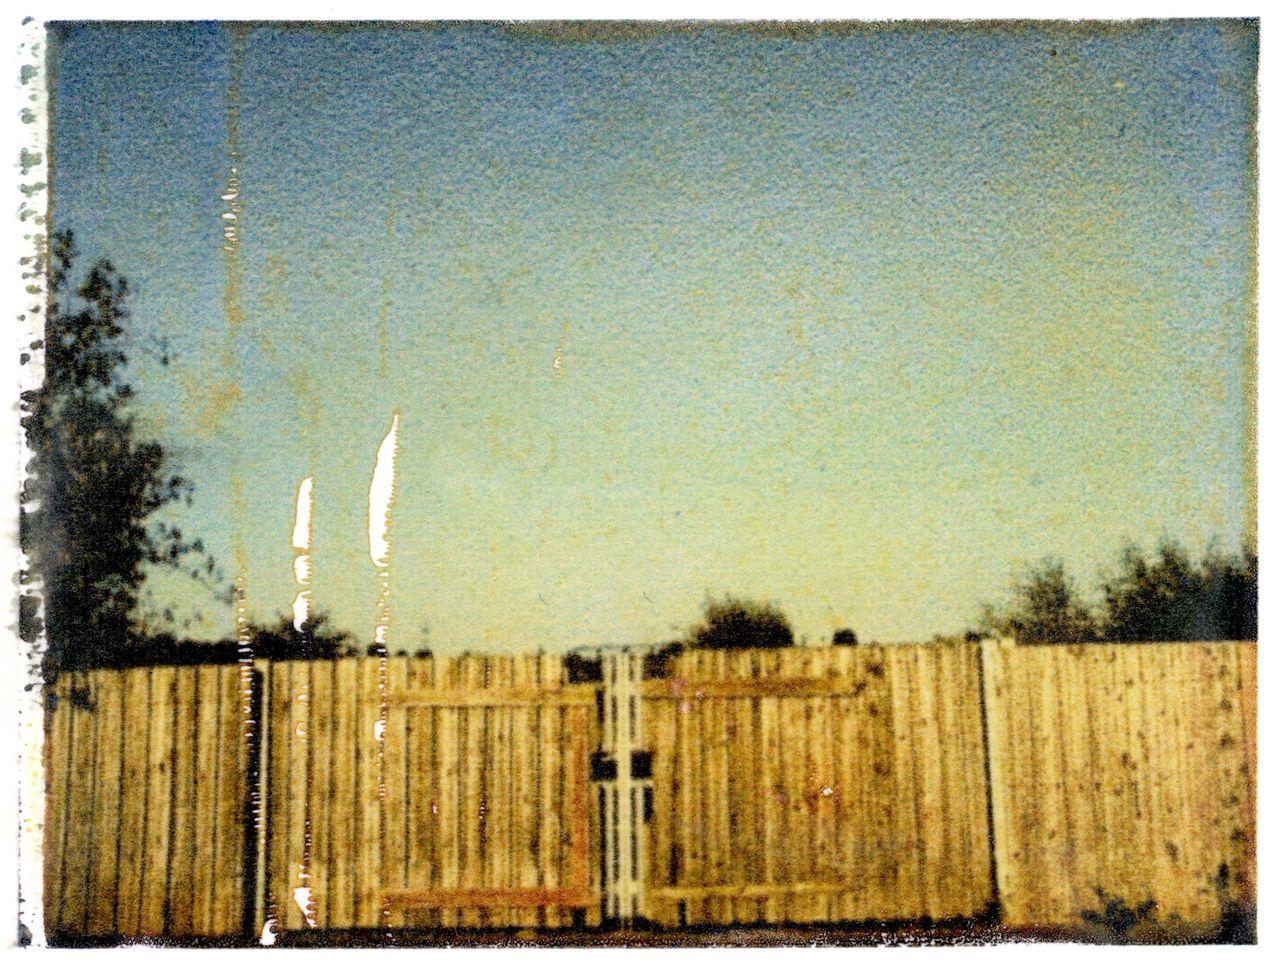 lockdown_fence_transfer.jpg